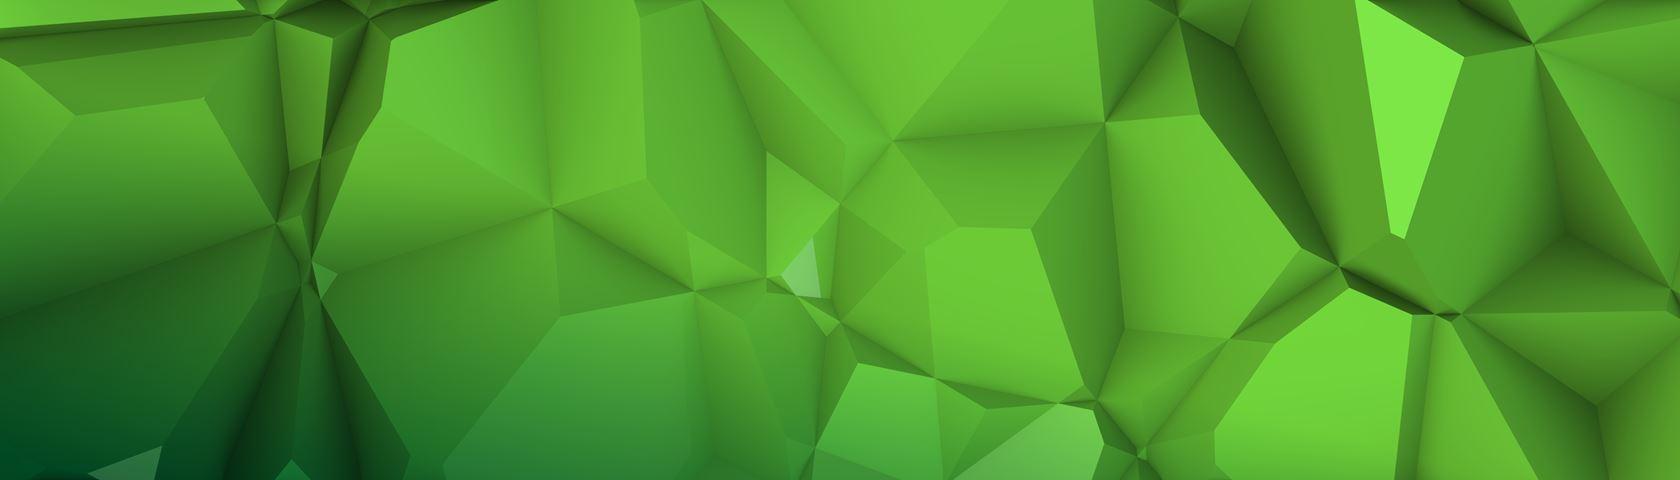 Polygon Green